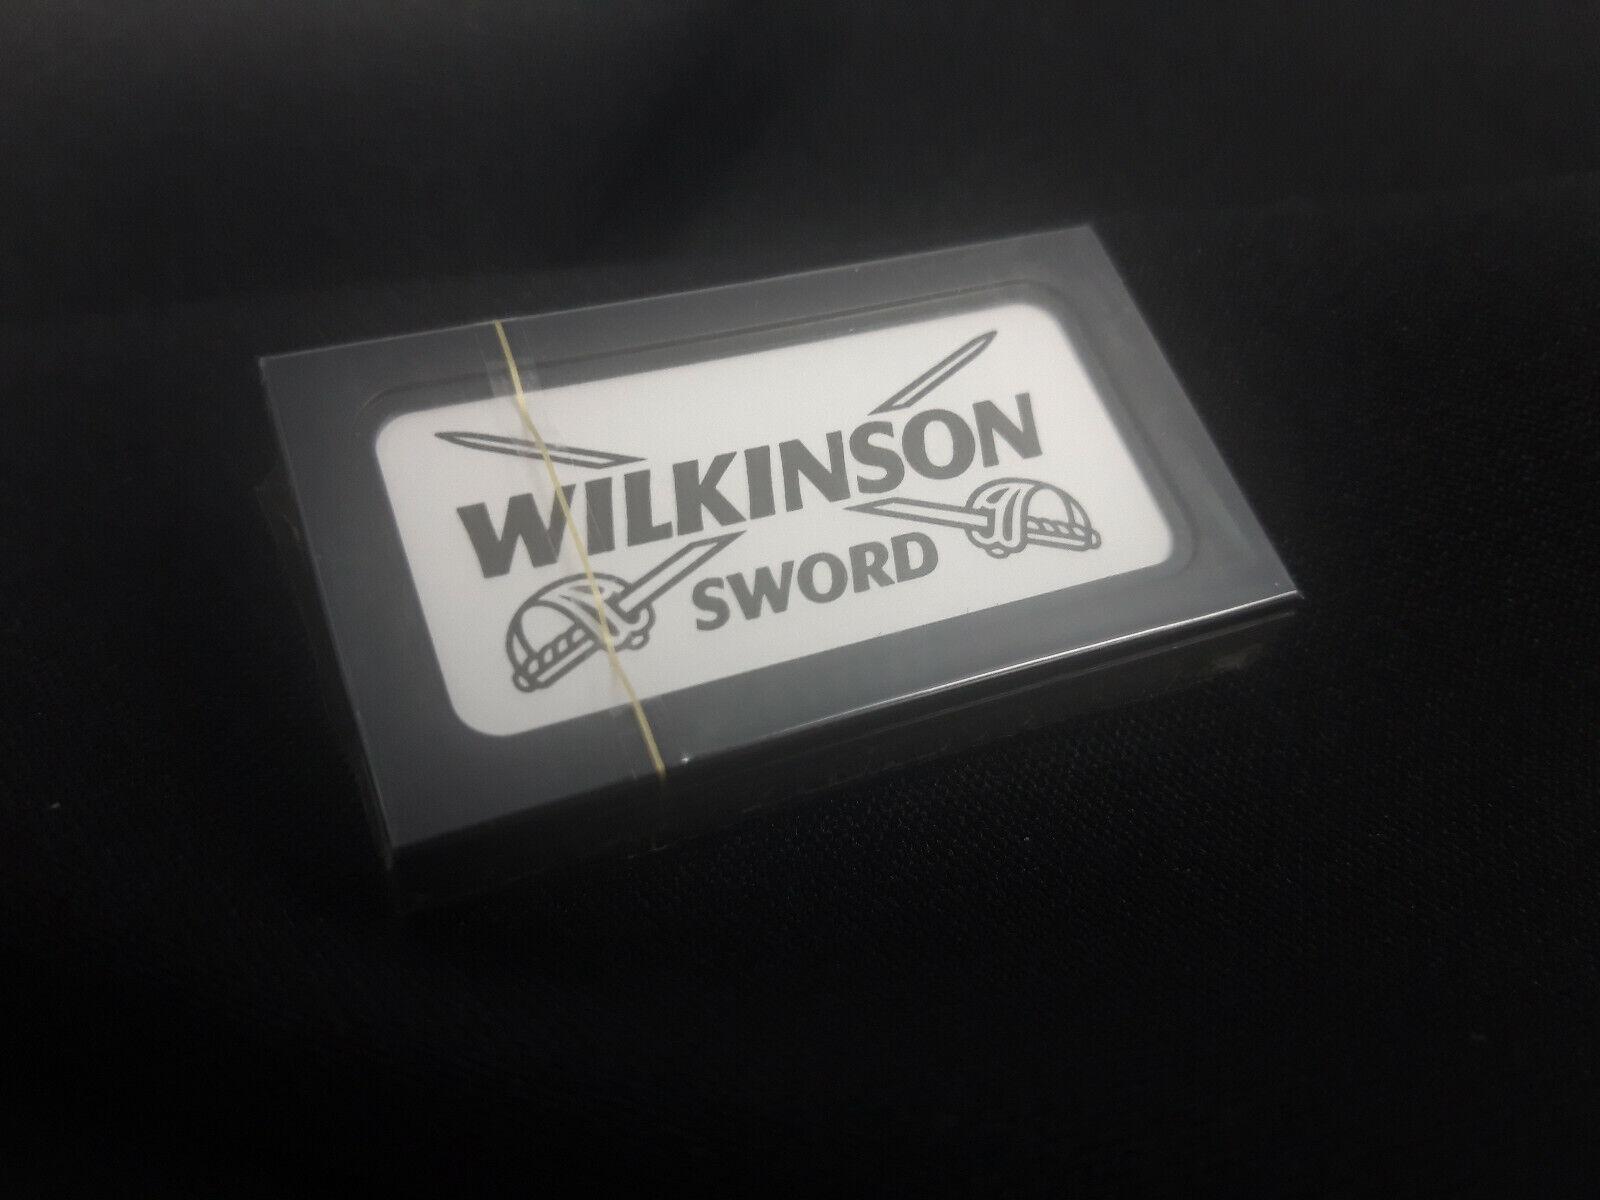 Rasierklingen von Wilkinson Sword beidseitig geschärft für Rasierhobel Klinge